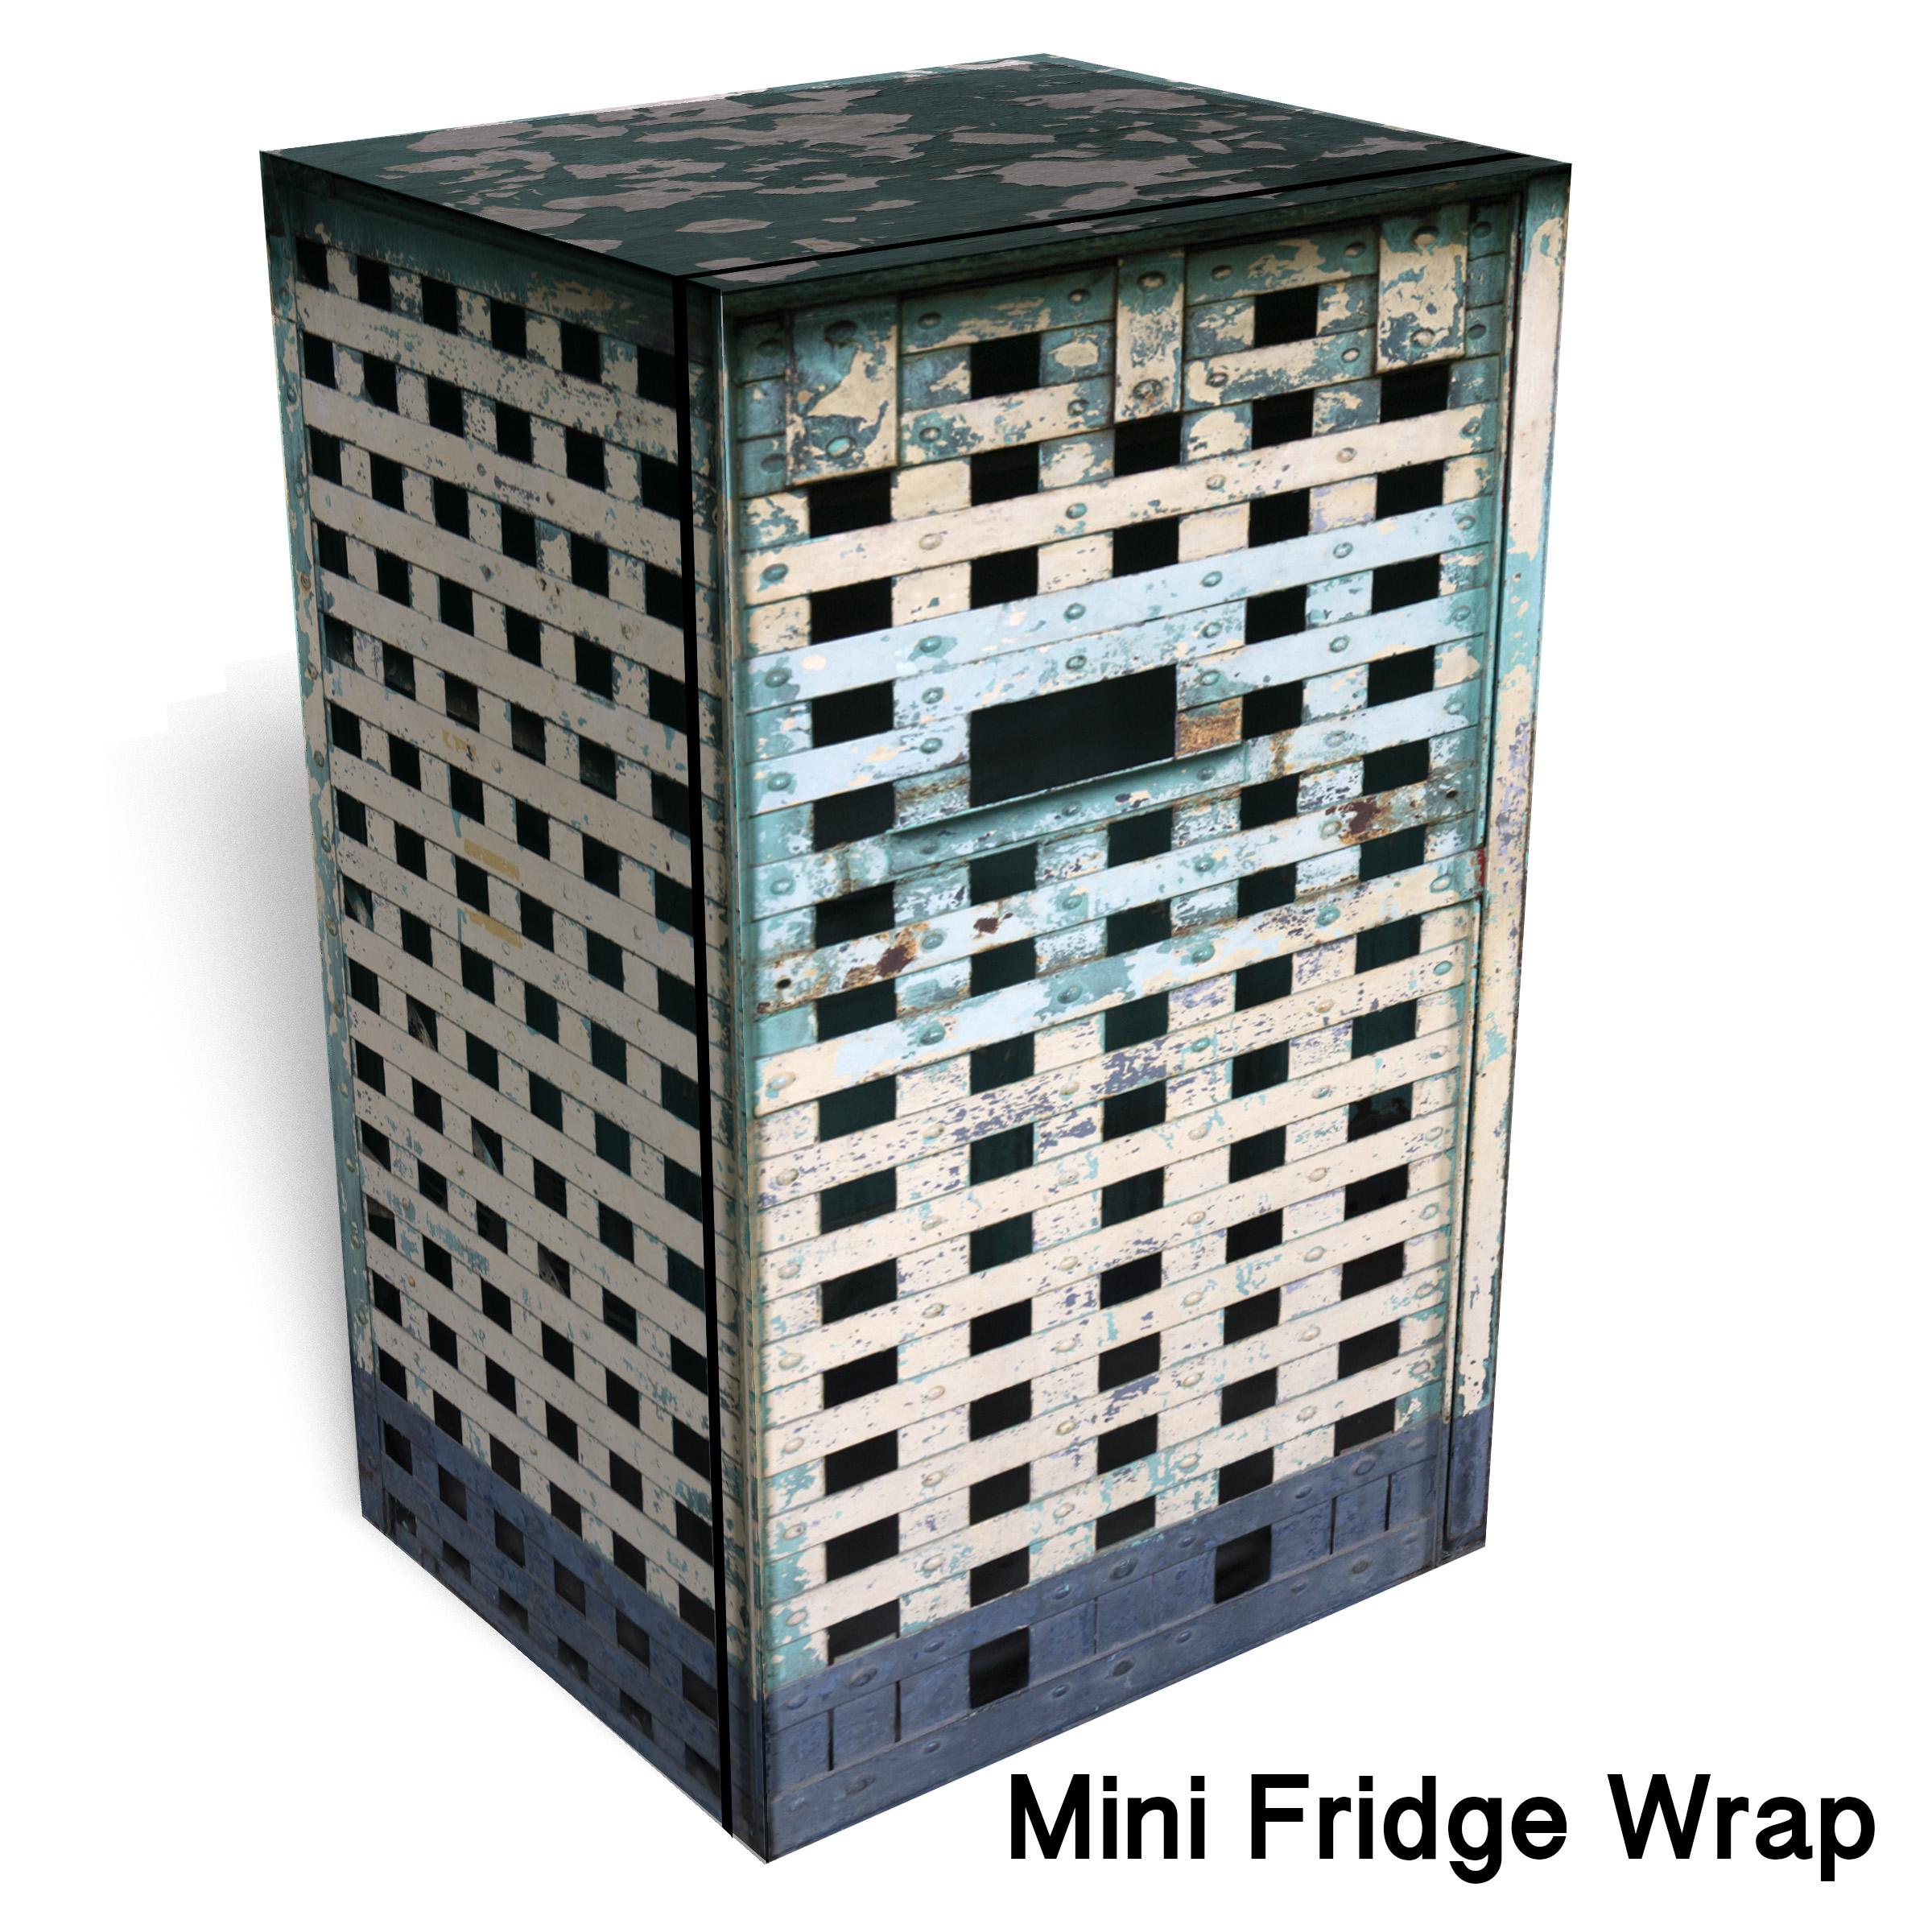 Jail Cell Bar Mini fridge Wrap